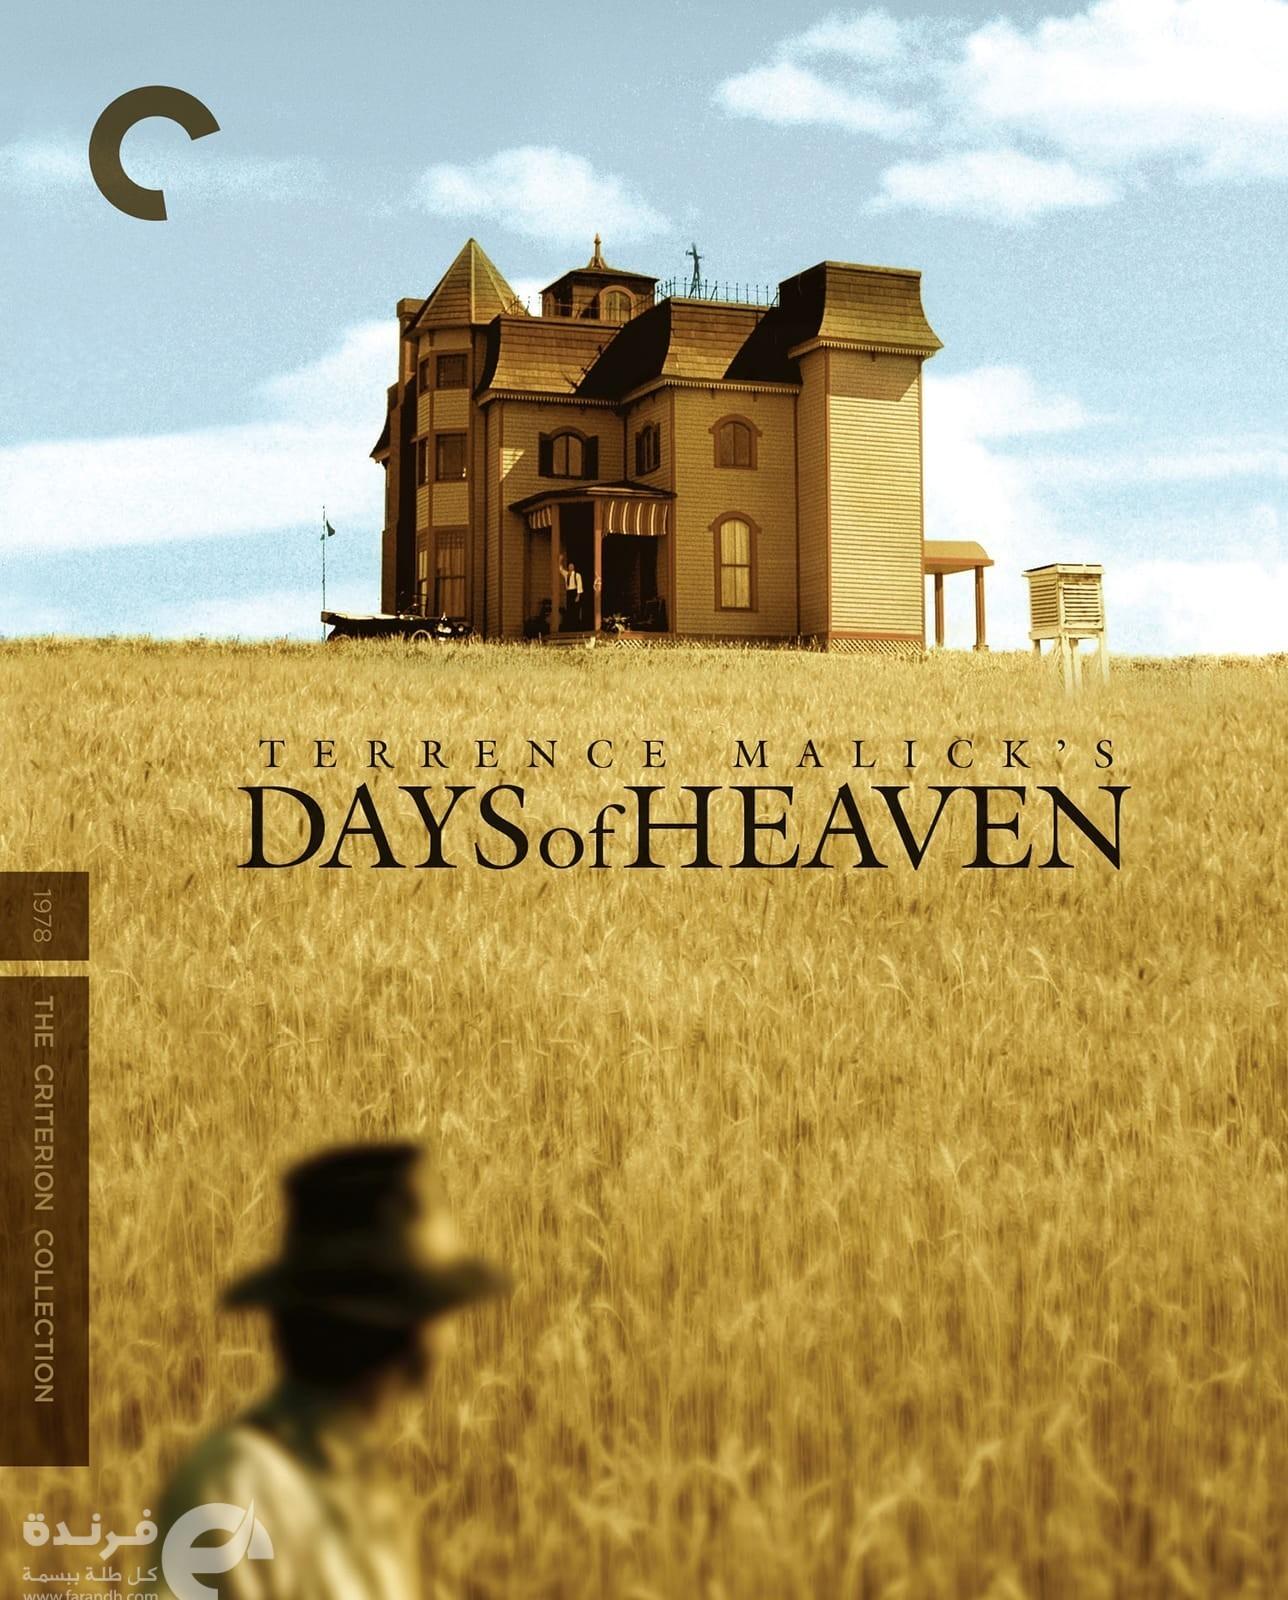 فيلم days of heaven